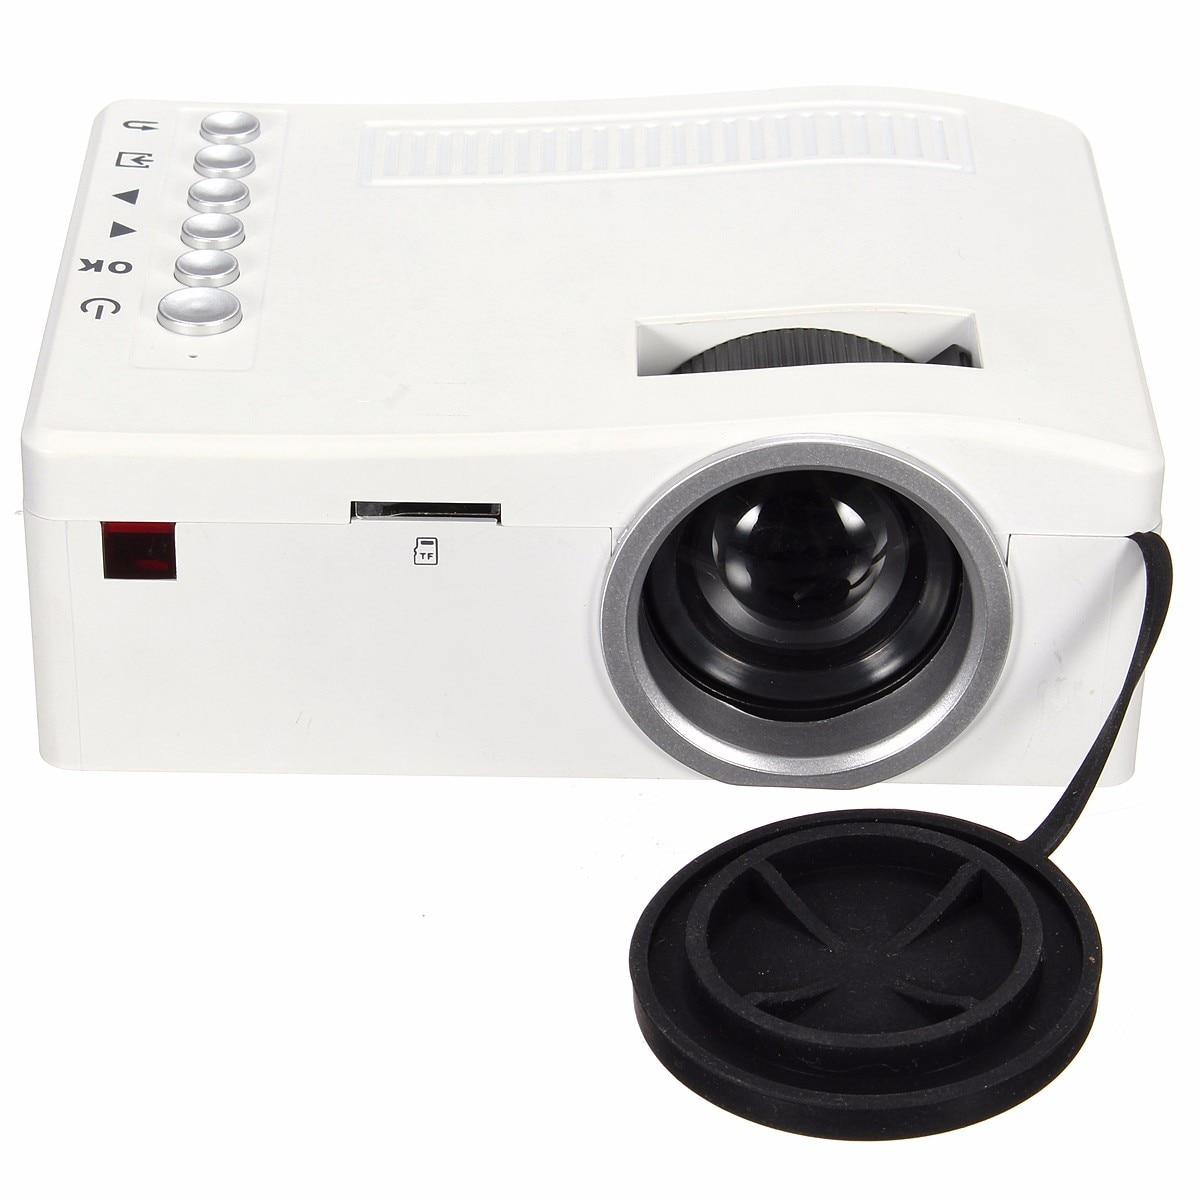 Portable Mini Full HD 1080P 320 x 180 Resolution LED Projector Cinema Theater PC VGA USB SD AV Input HDMI Home Theatre System